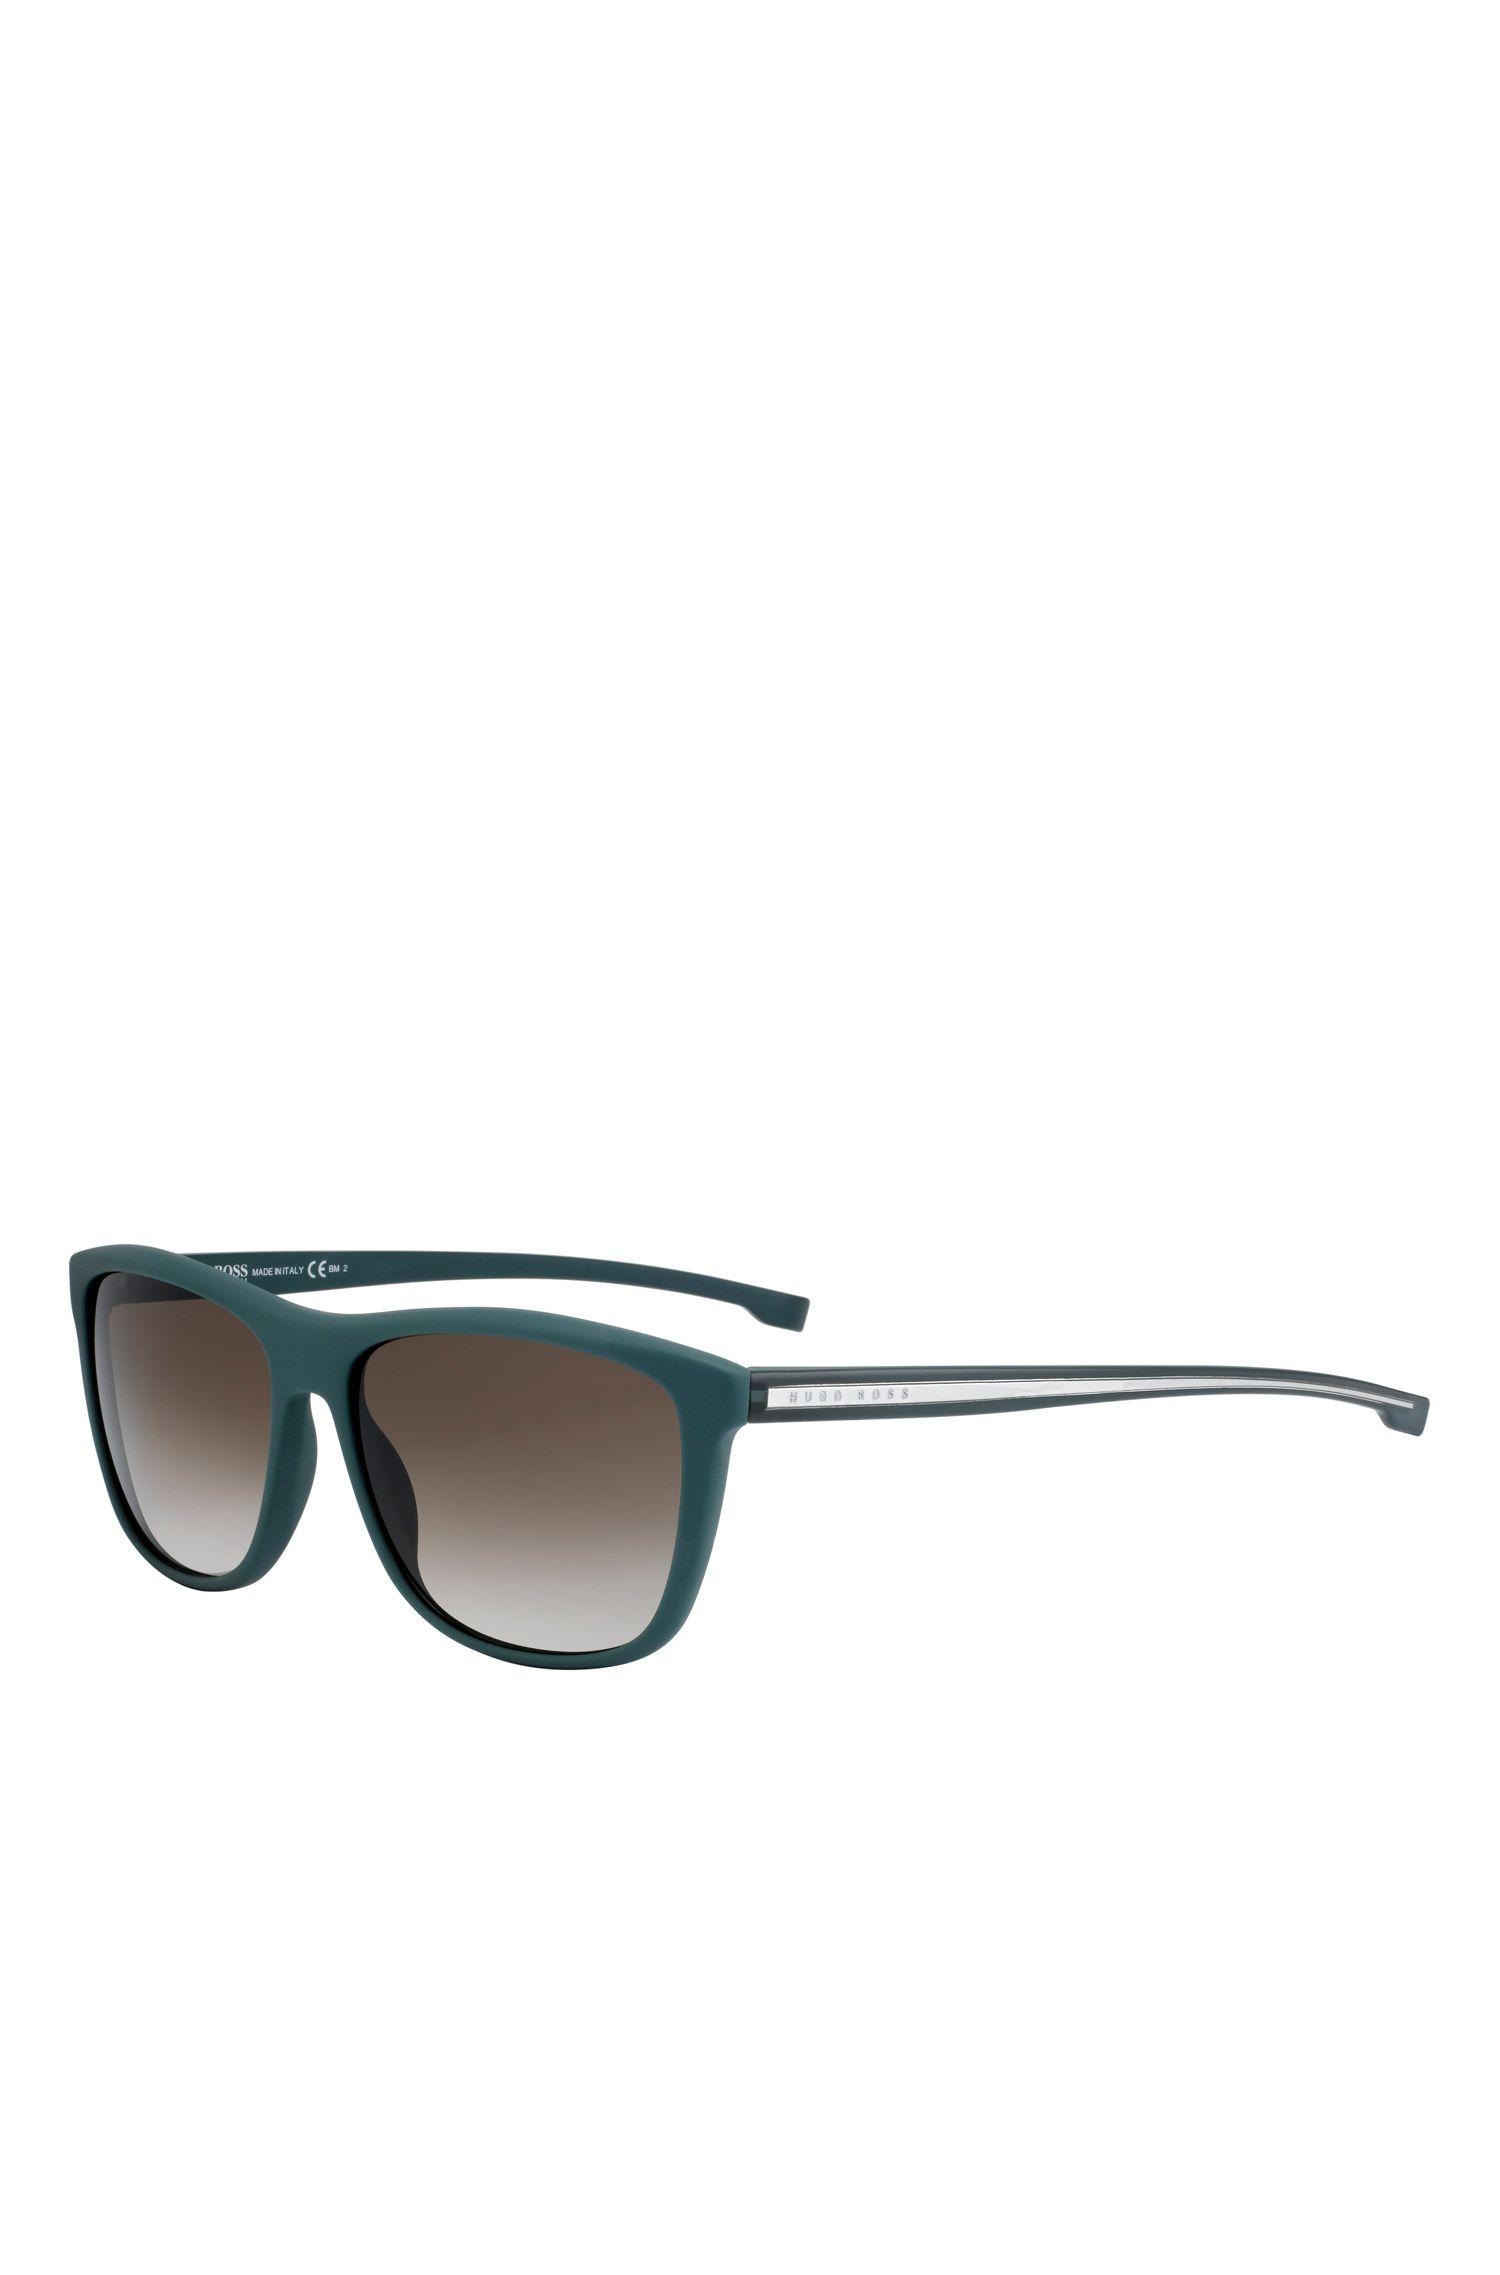 'BOSS 0874S' | Gradient Lens Top Bar Sunglasses